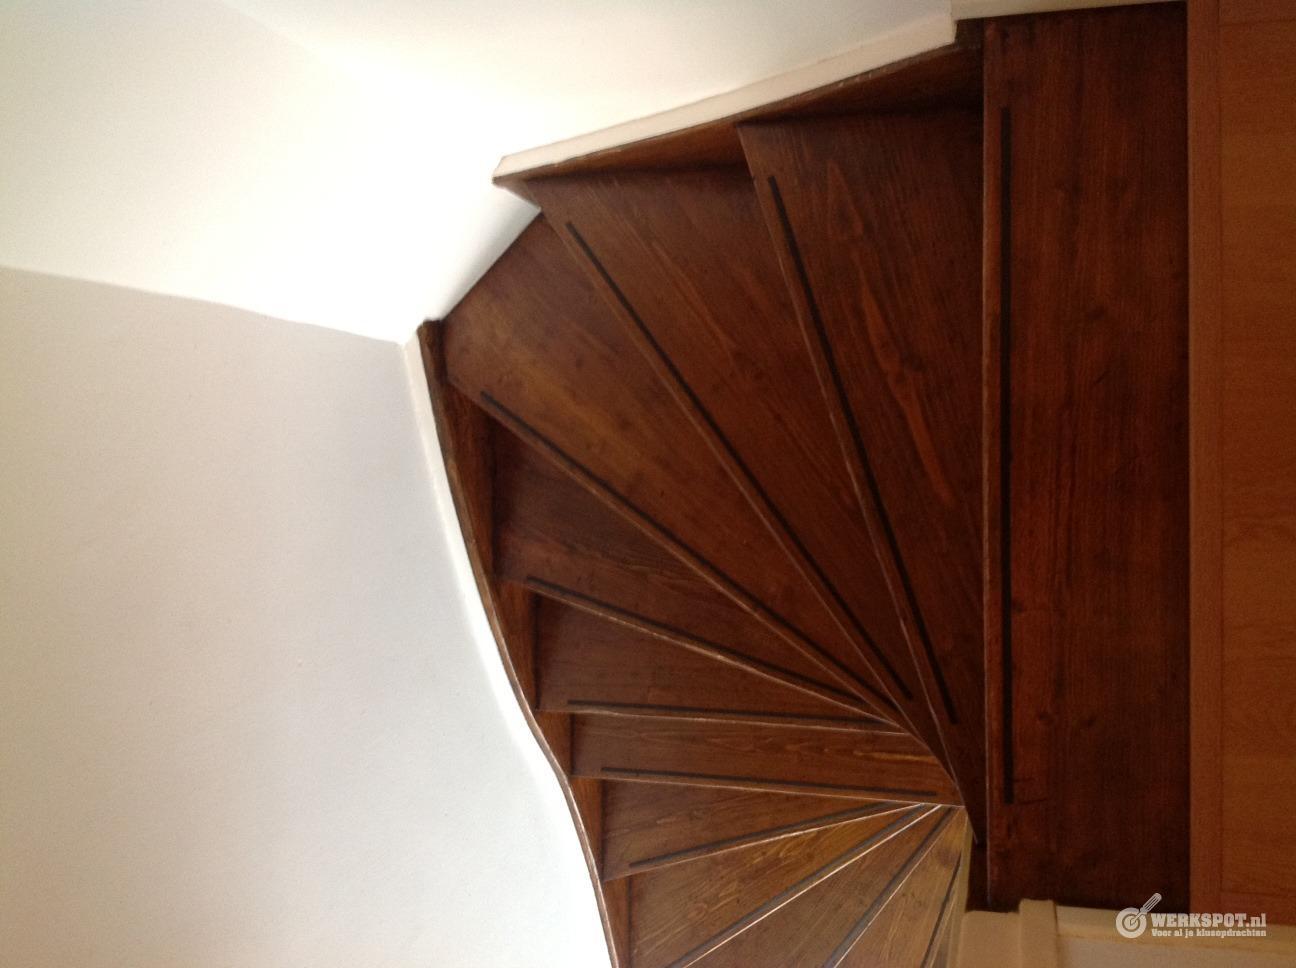 Houten trap schuren lakken beitsen werkspot - Houten trap ...